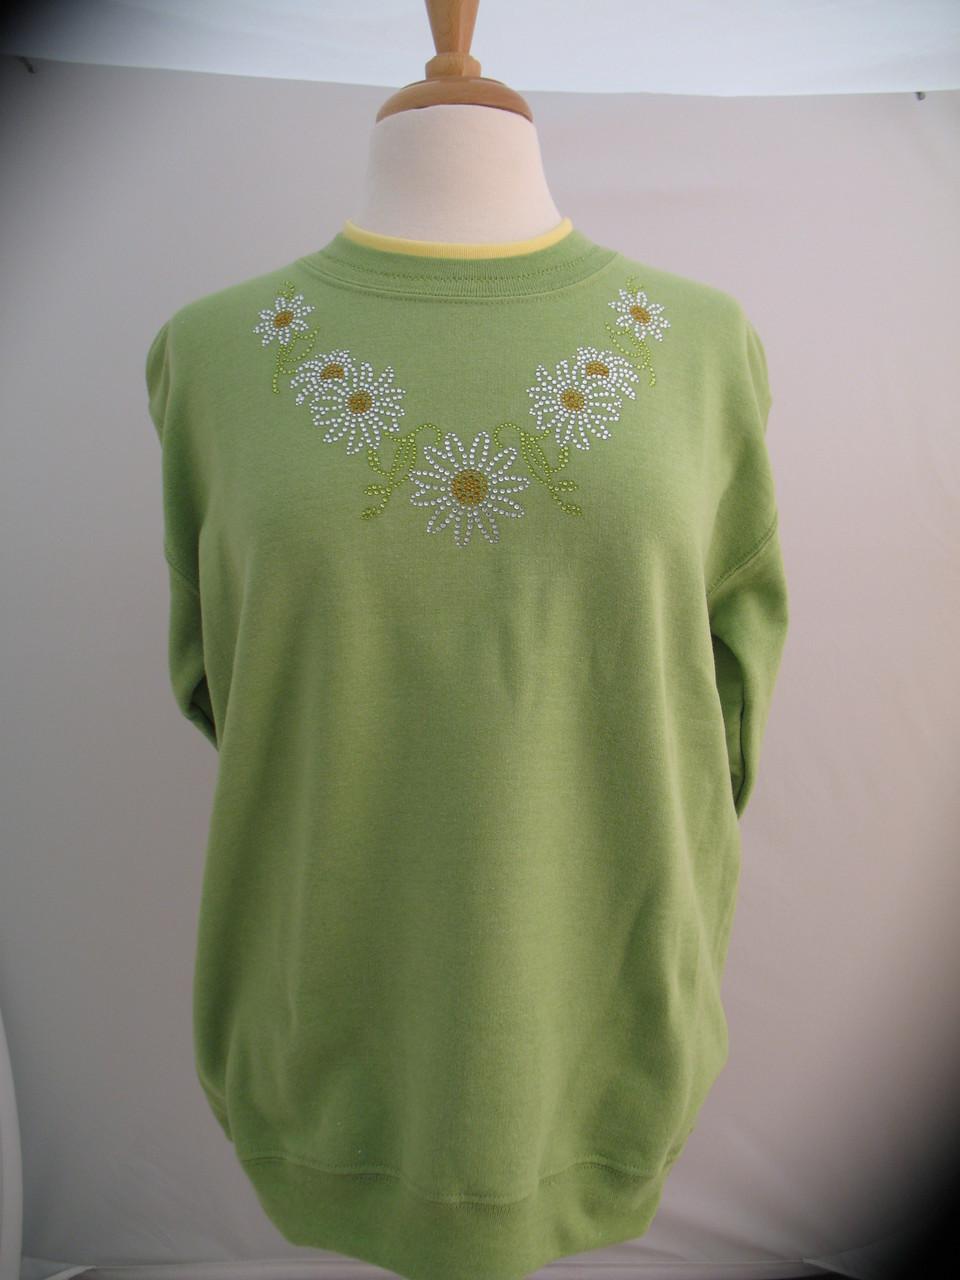 Daisy Stone Sweatshirt Schrock Shoppes